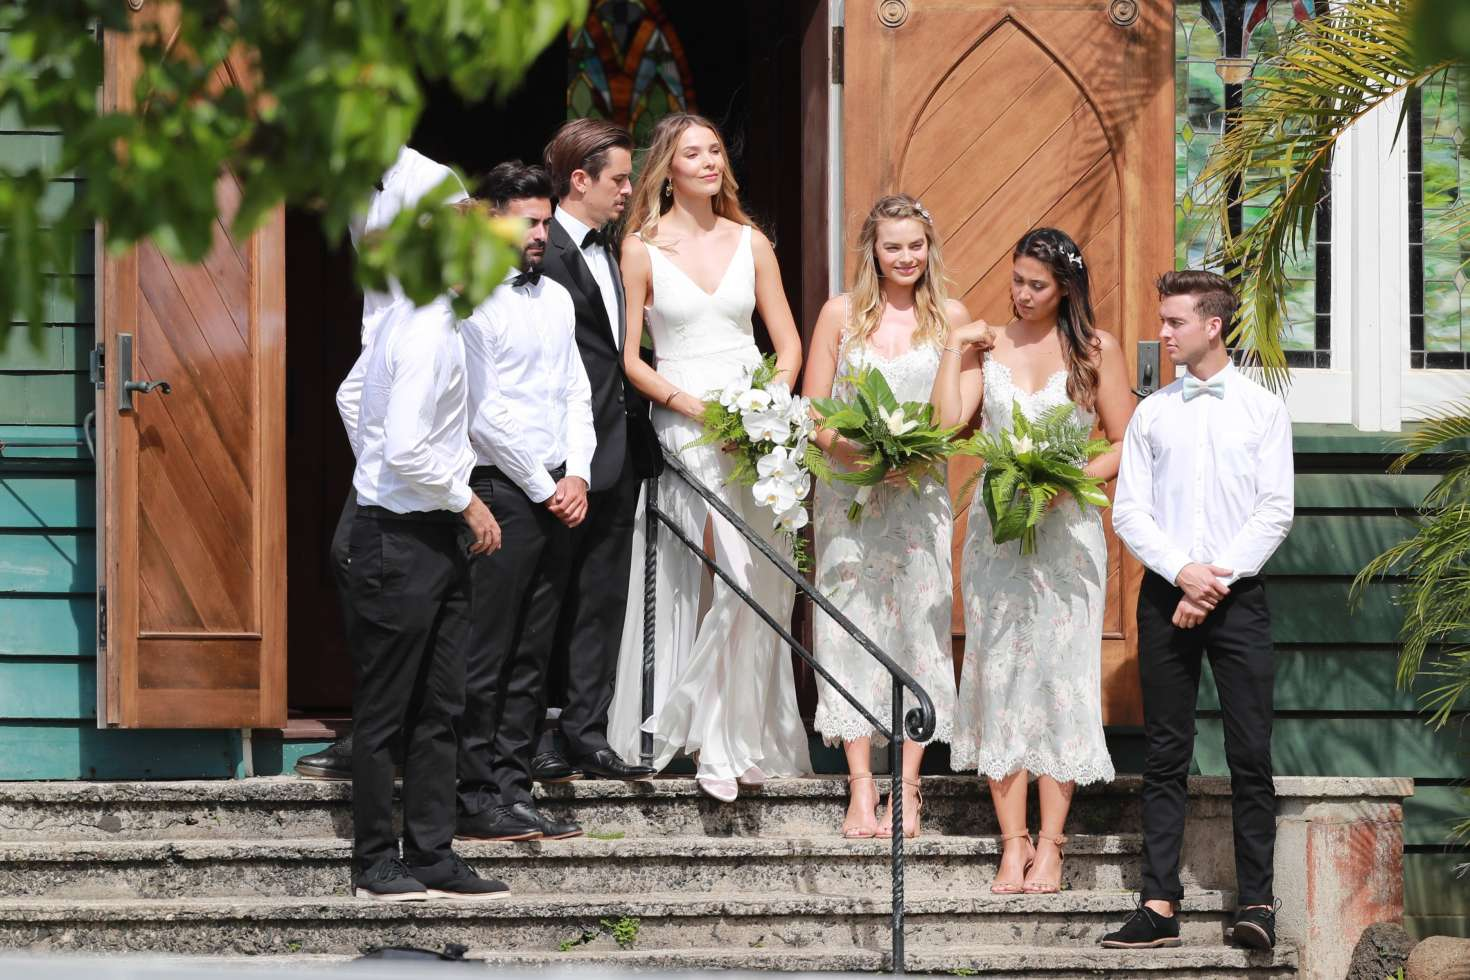 Margot Robbie Wedding.Margot Robbie At Friends Wedding In Kauai 03 Gotceleb